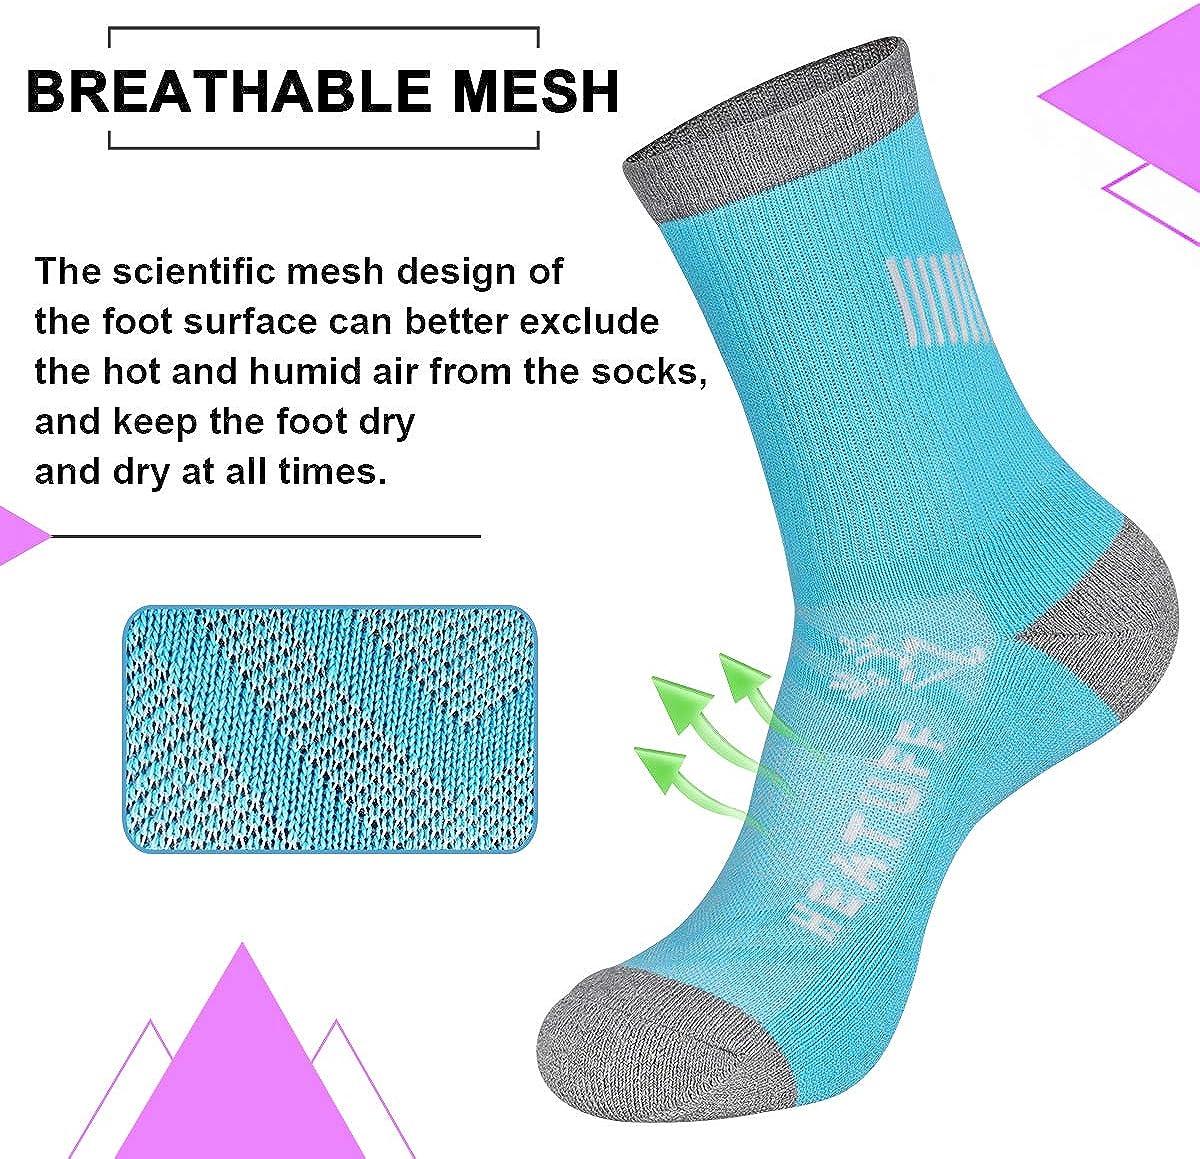 Heatuff Womens 6 Pack Hiking Crew Socks Performance Athletic Cushion Outdoor Trekking Sock: Clothing